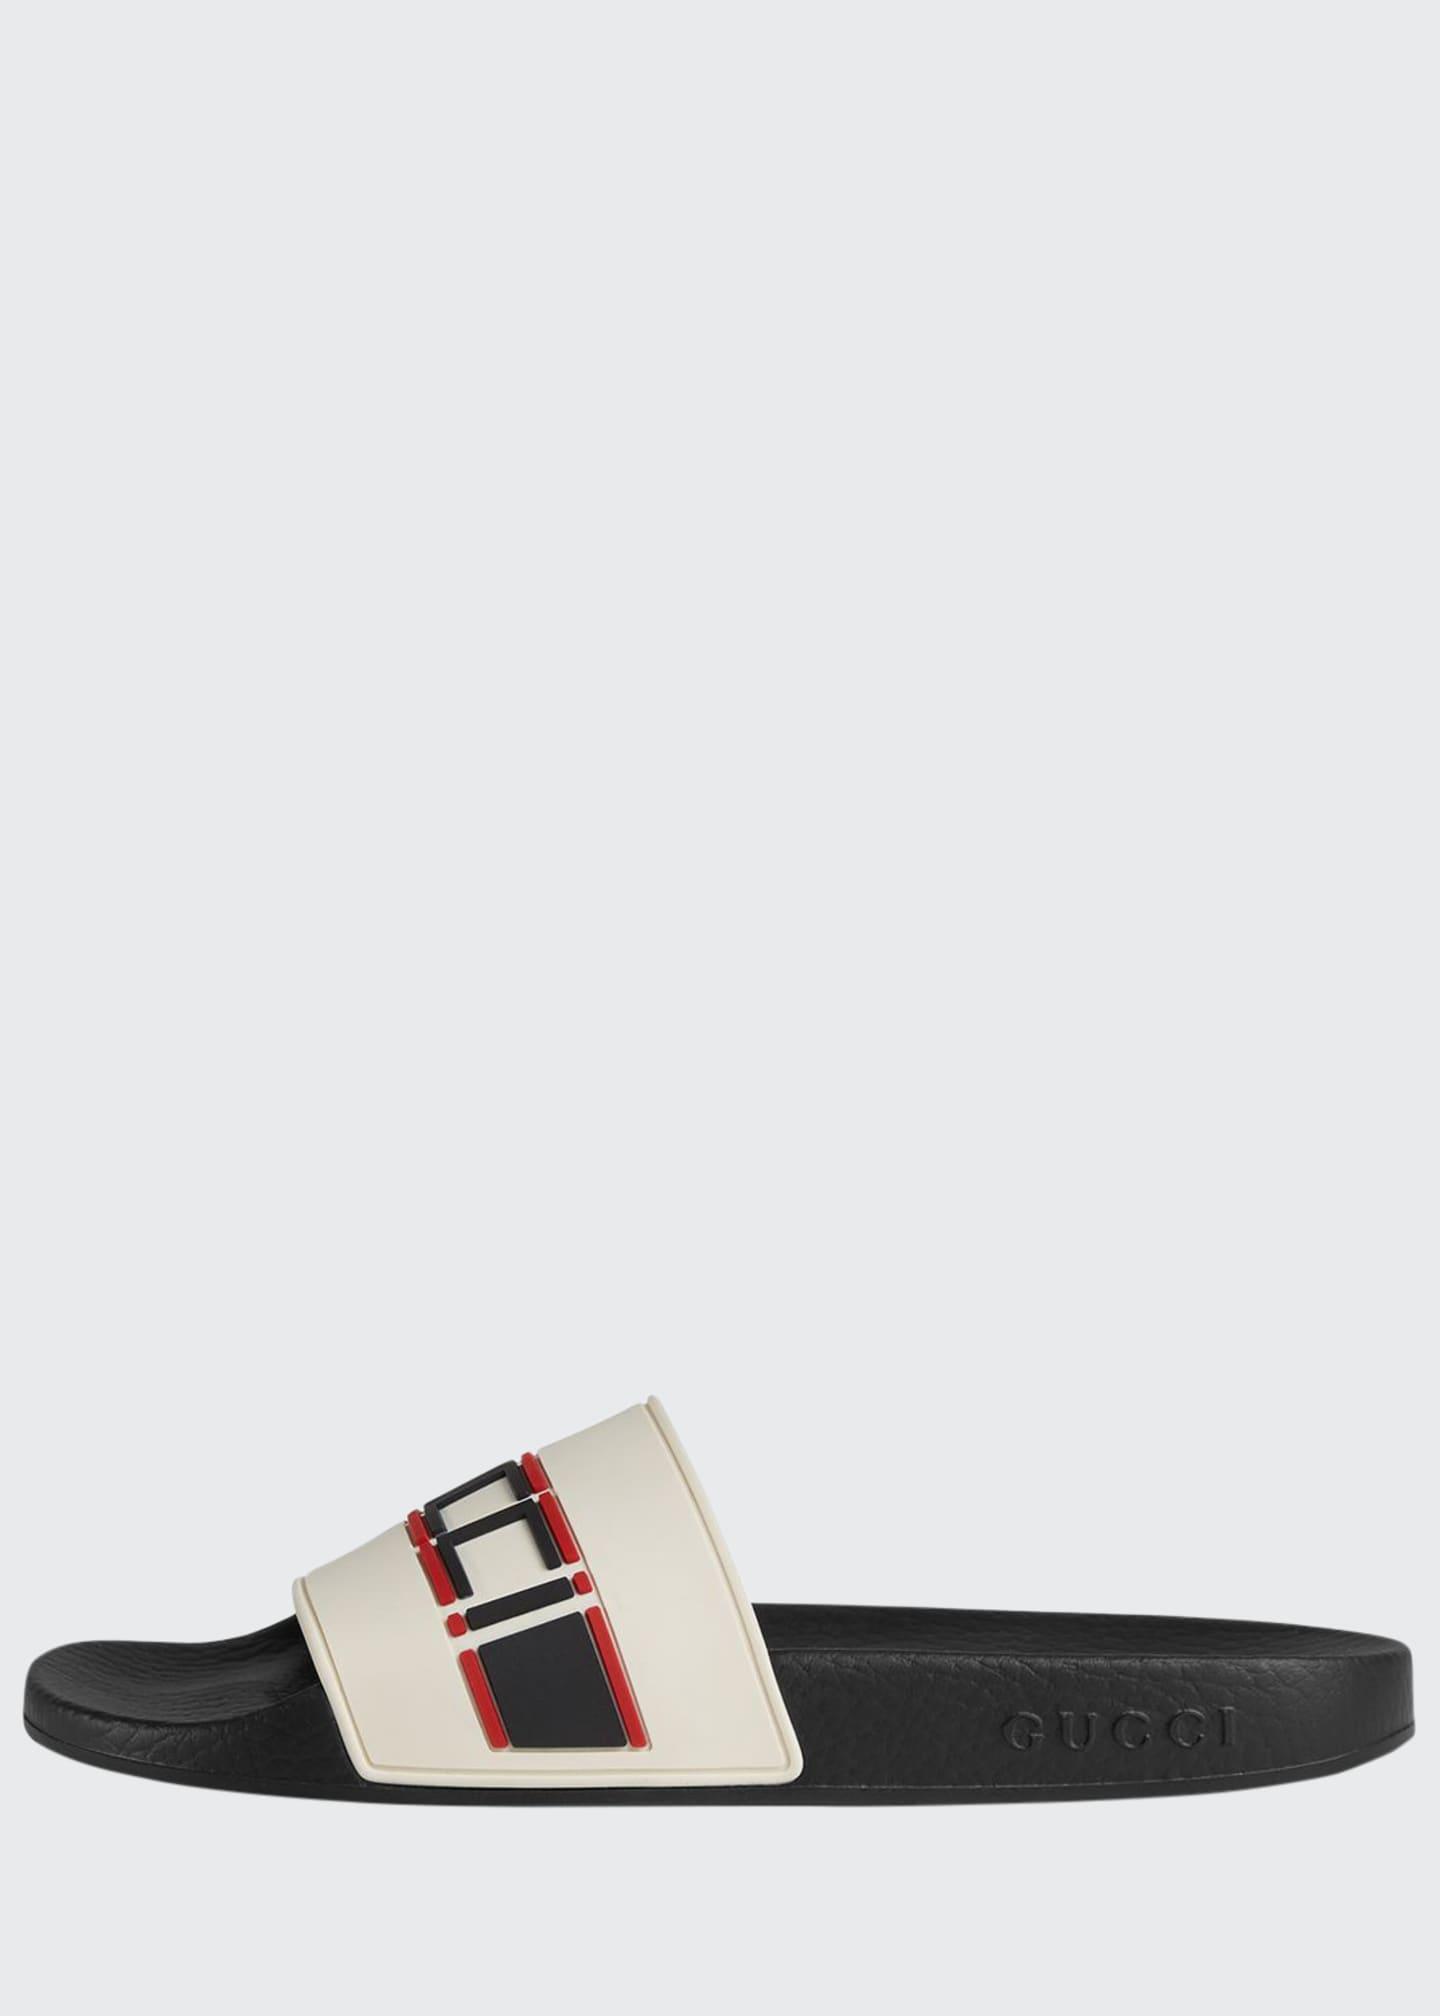 Gucci Logo Rubber Pool Sandals